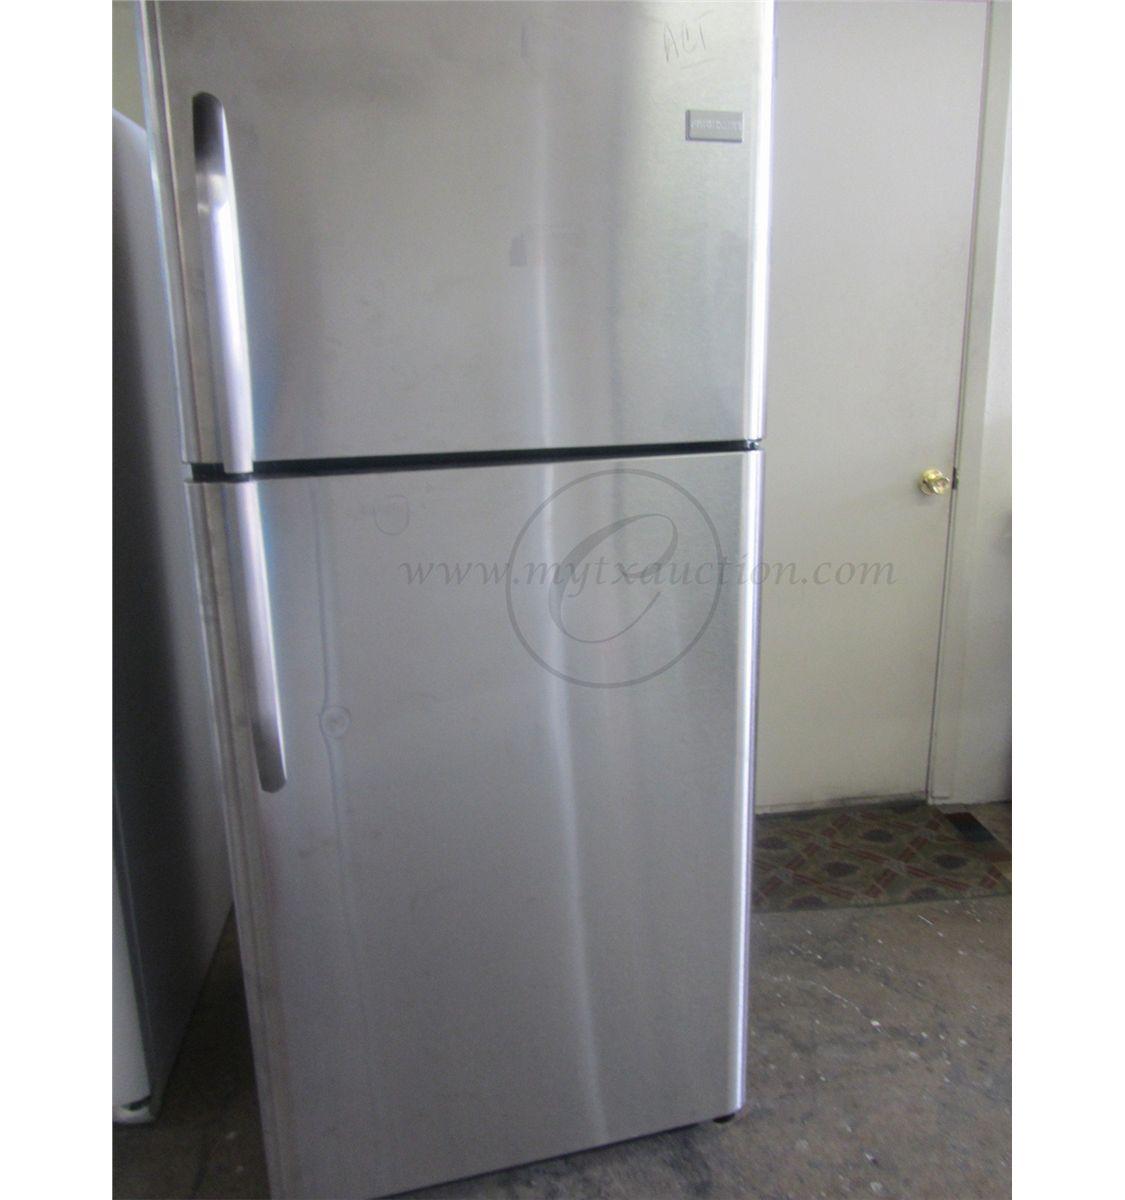 Frigidaire 20 6 Cubic Foot Top Freezer Refrigerator